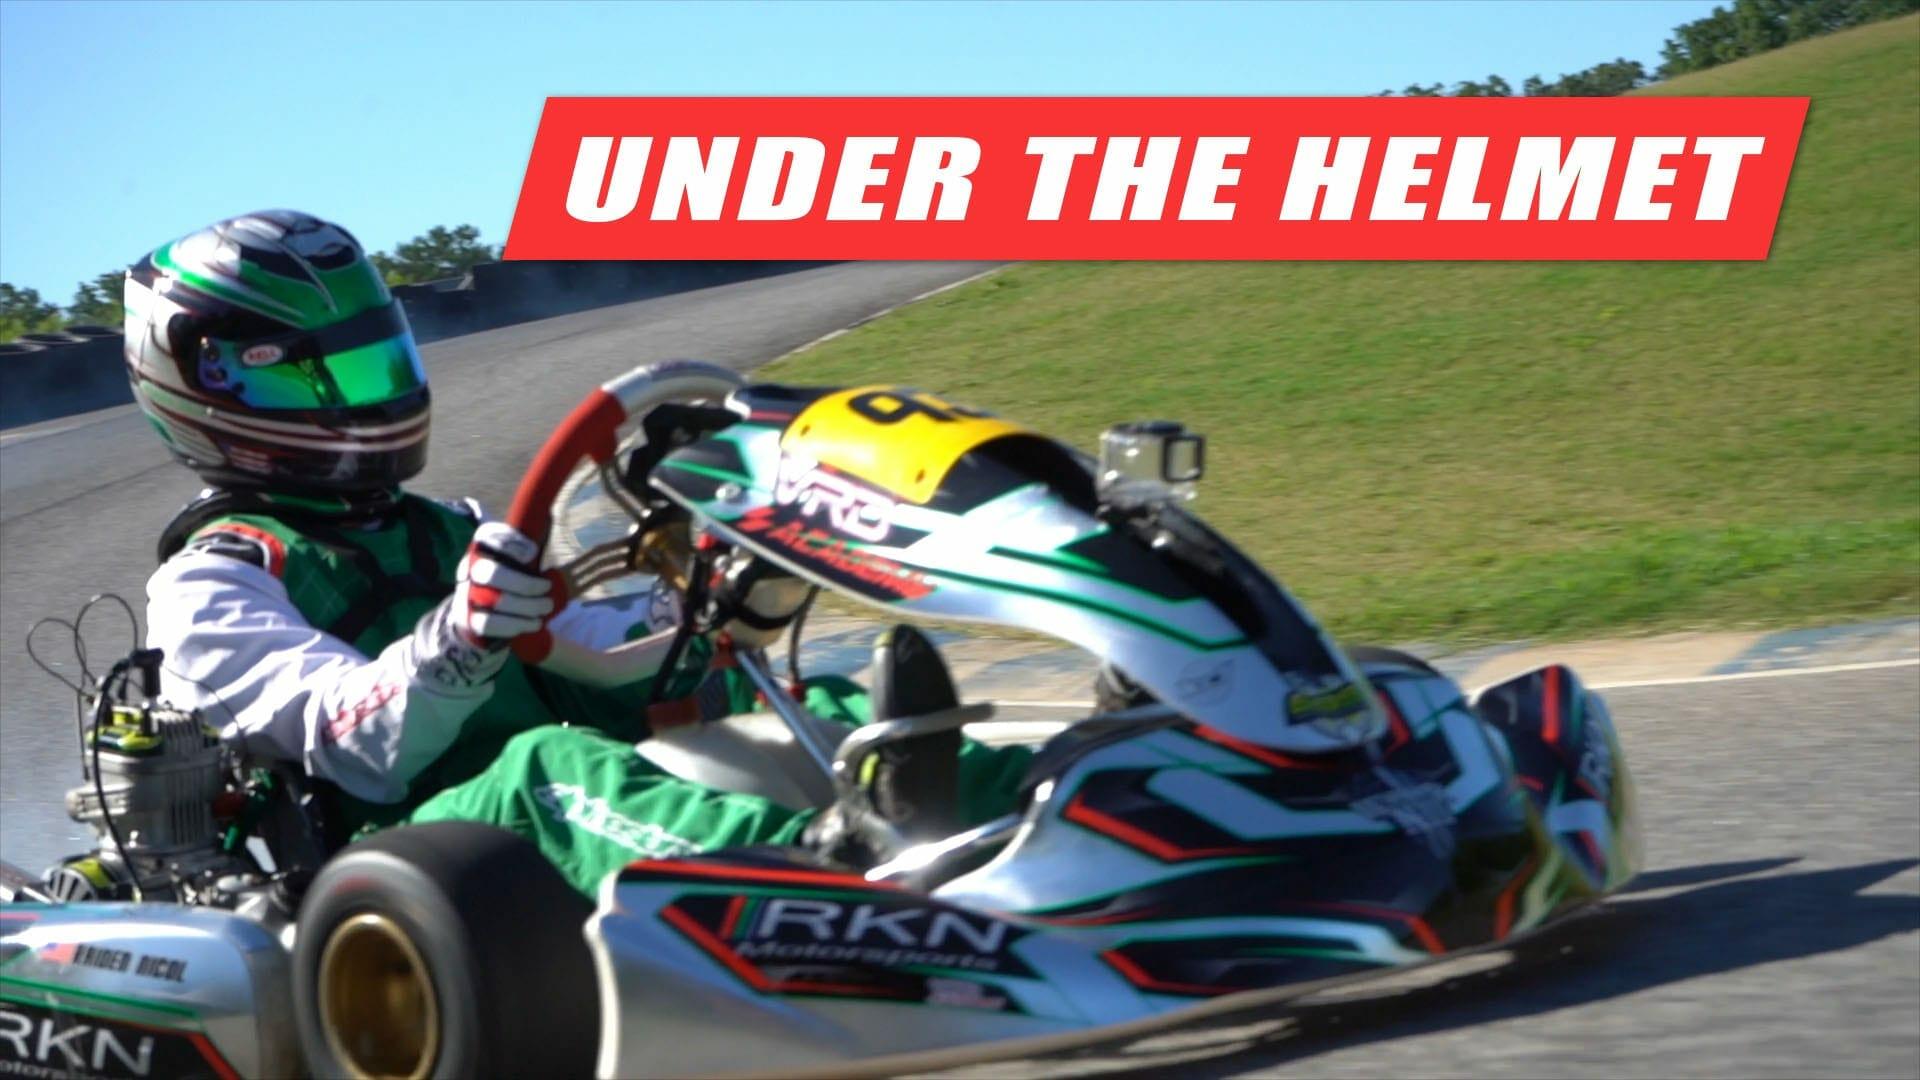 Under the helmet Raiden - Junior Discovery Experience